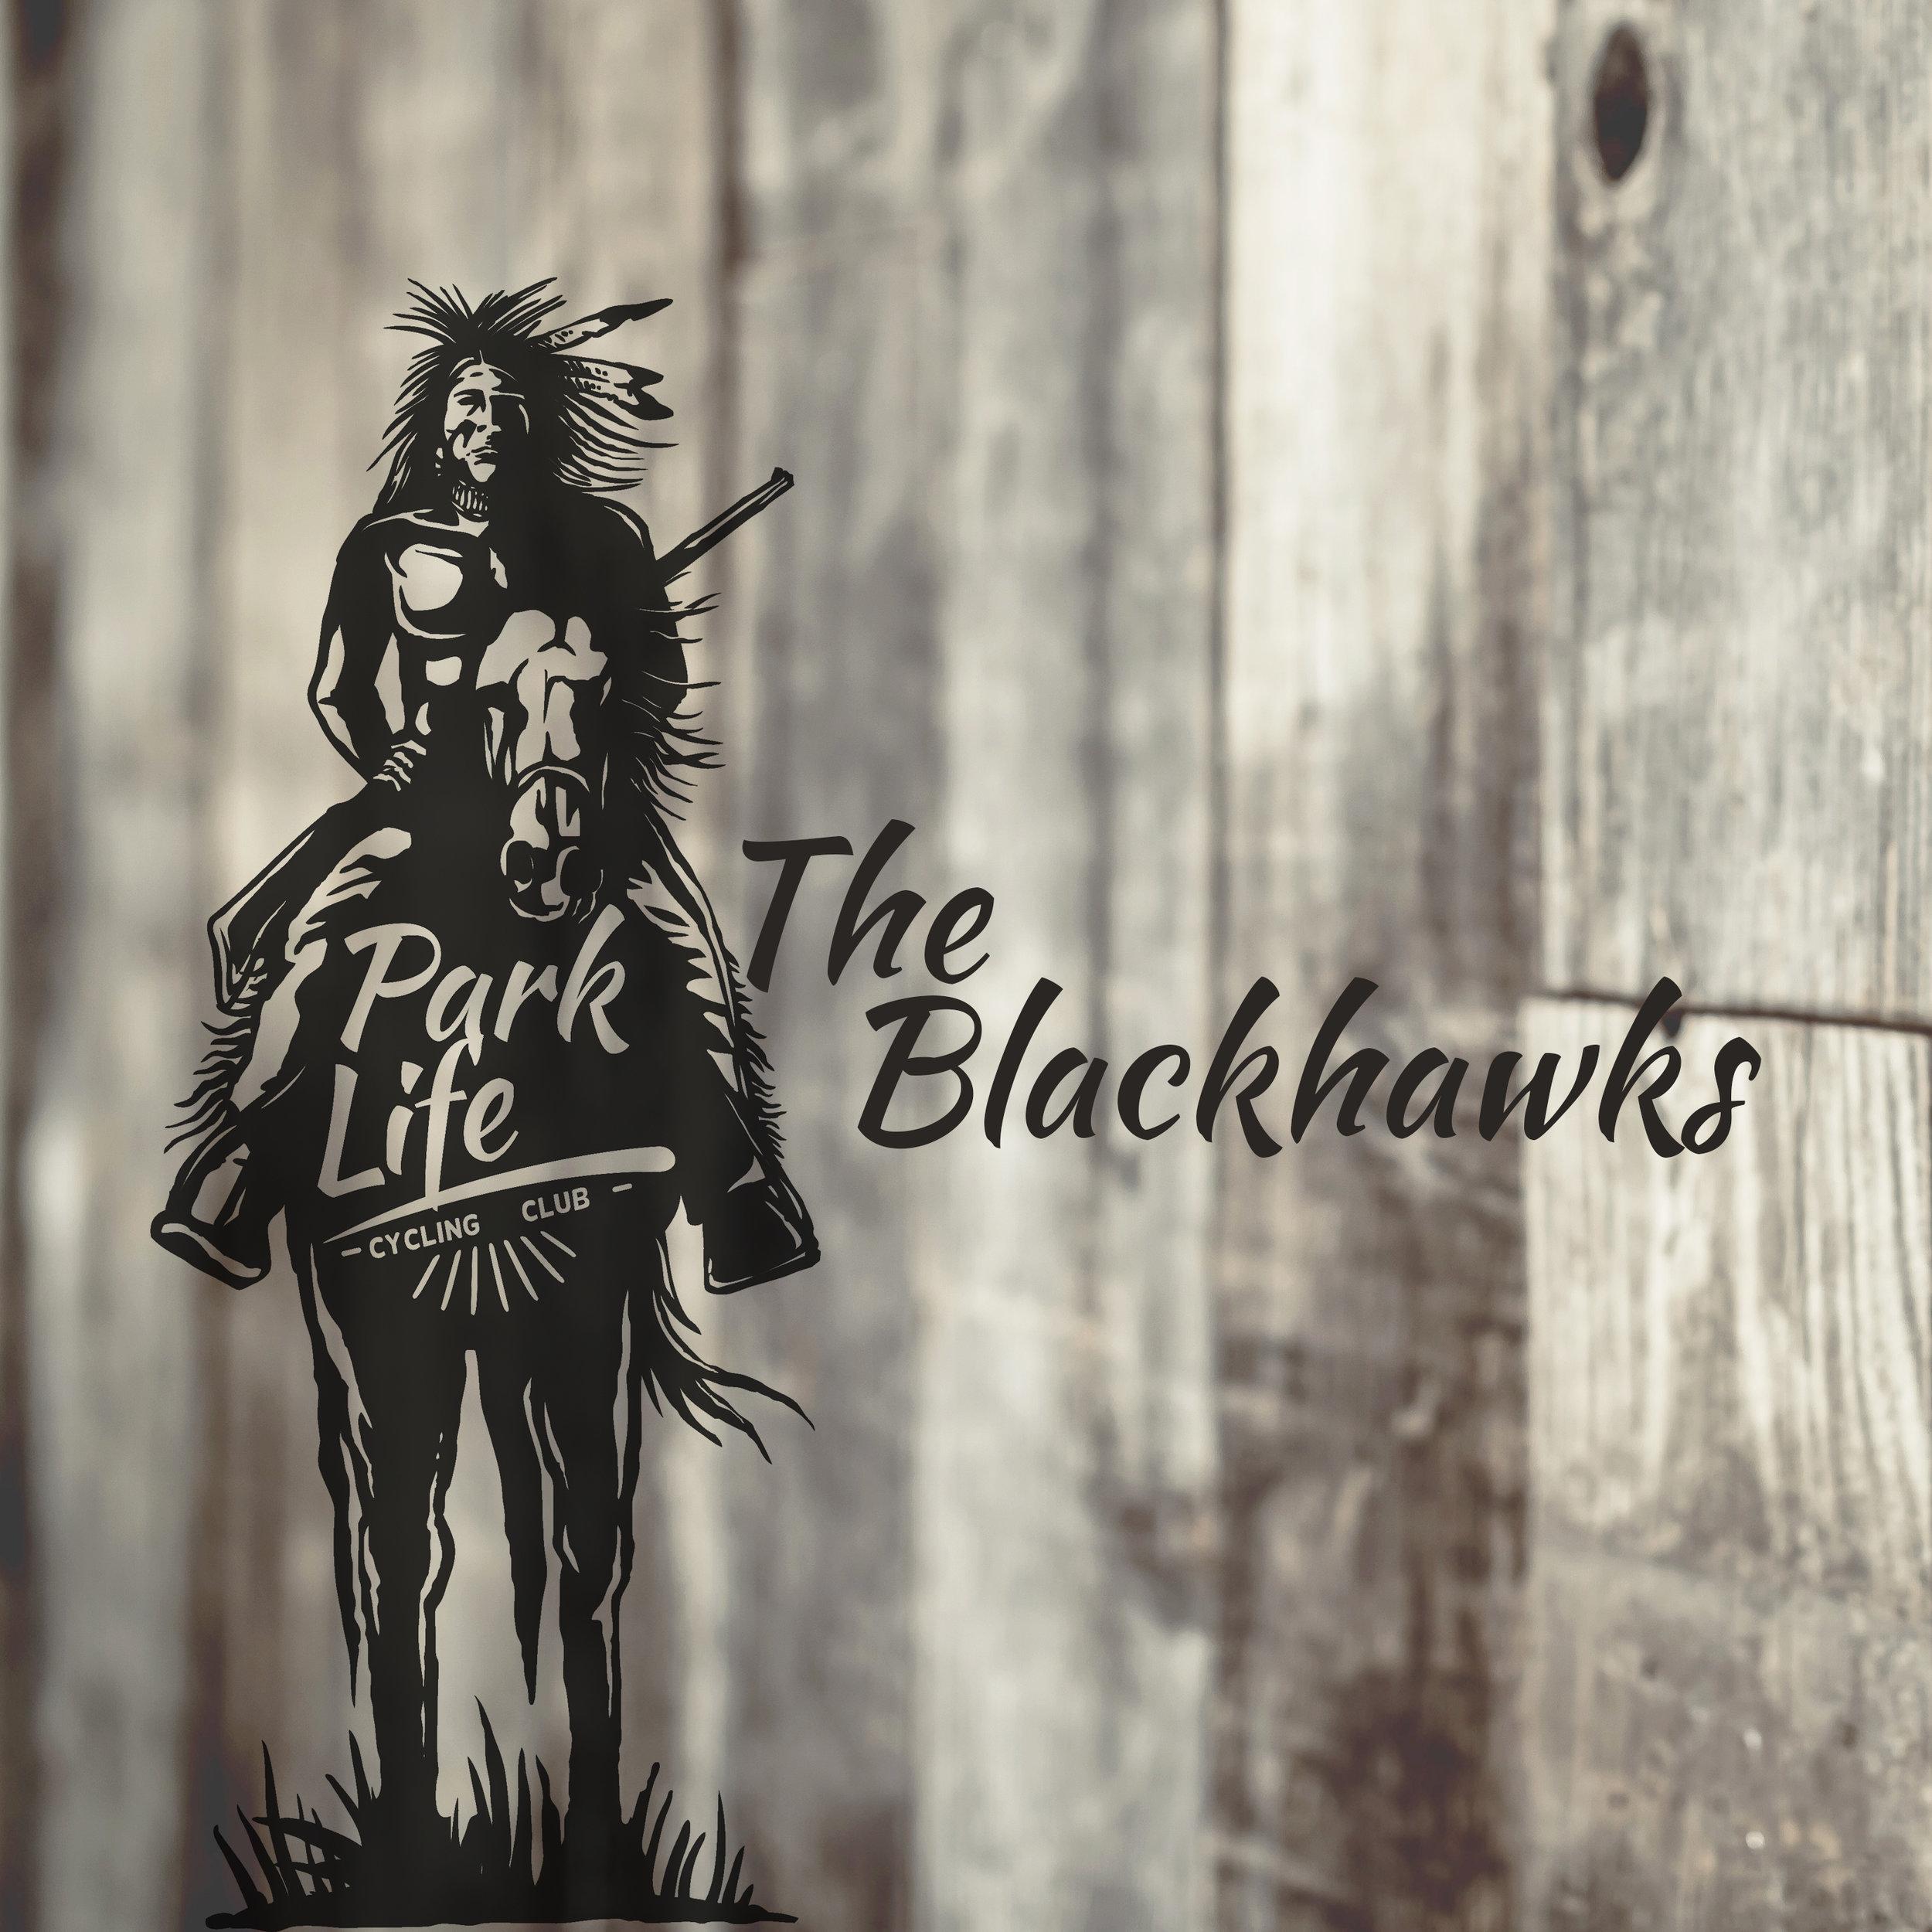 ParkLife-Blackhawks.jpg